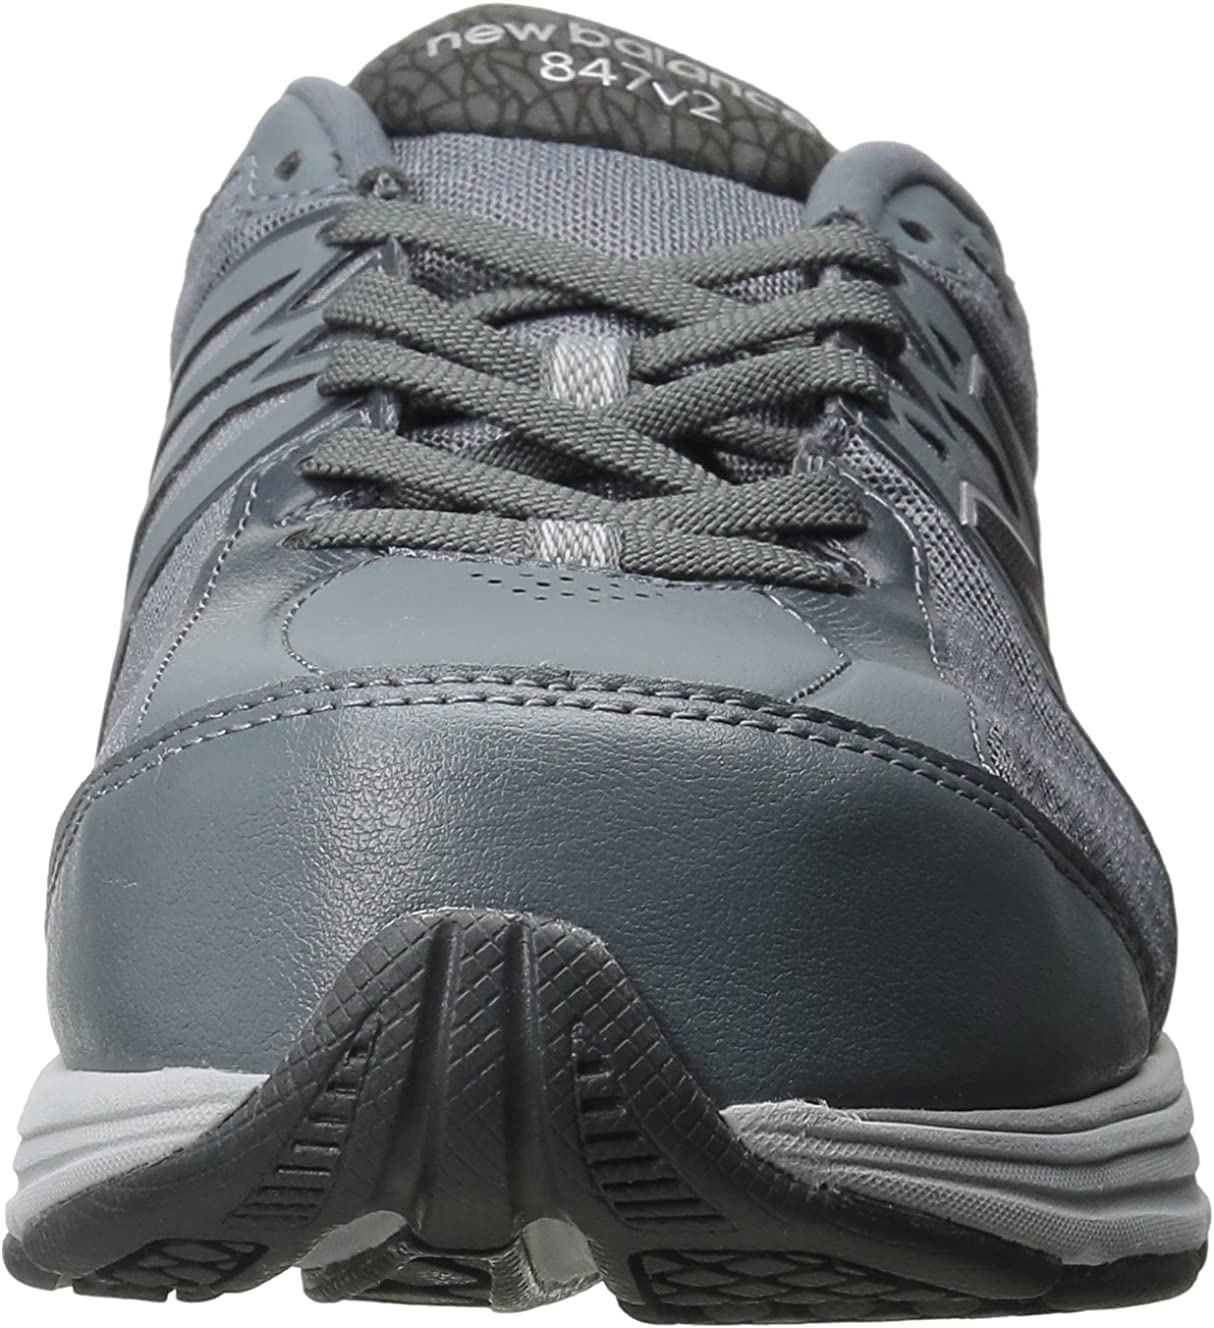 New Balance Men's MW847V2 Walking Shoe